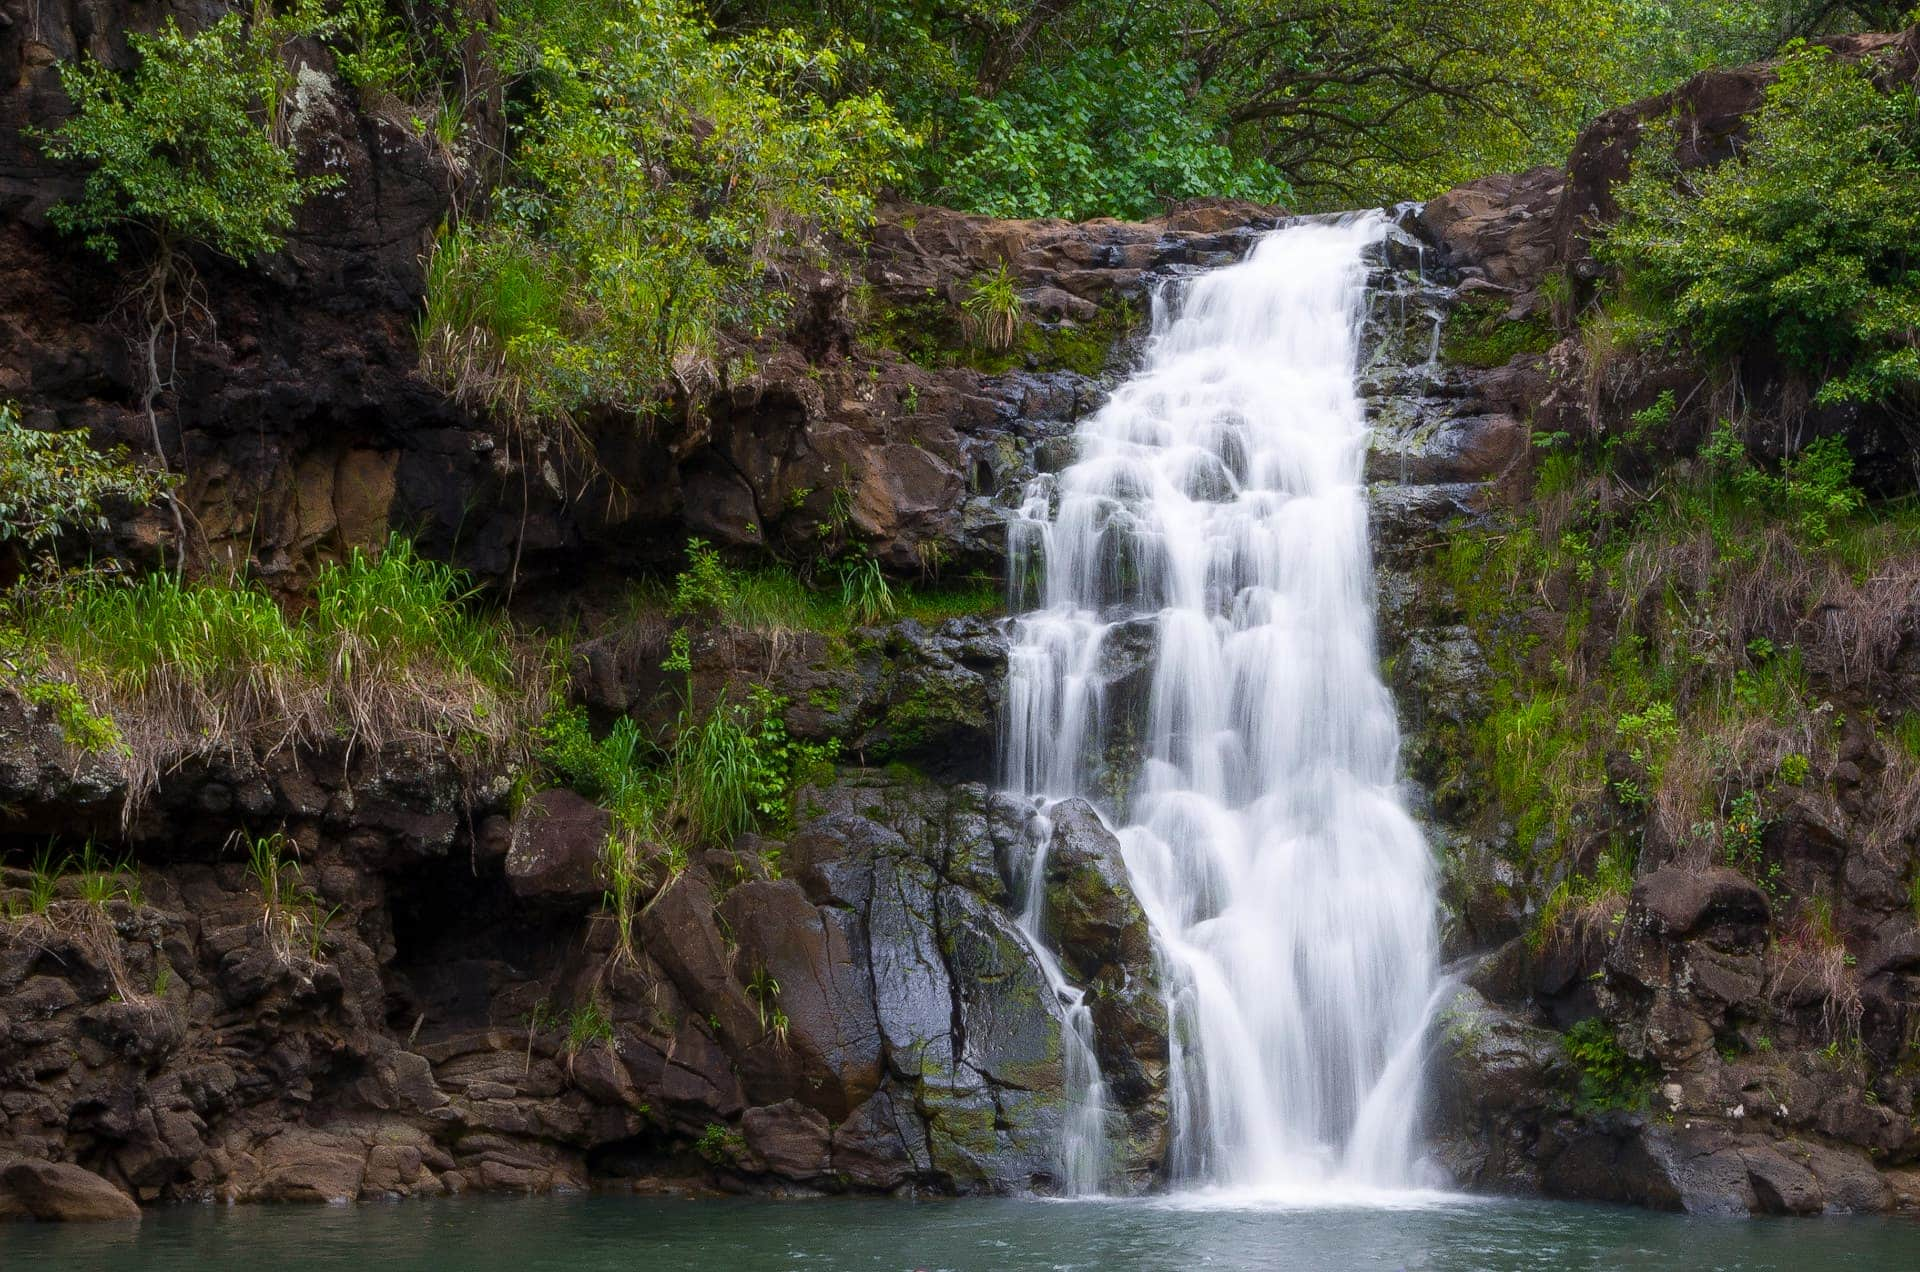 Our 10 Favorite O'ahu Waterfalls